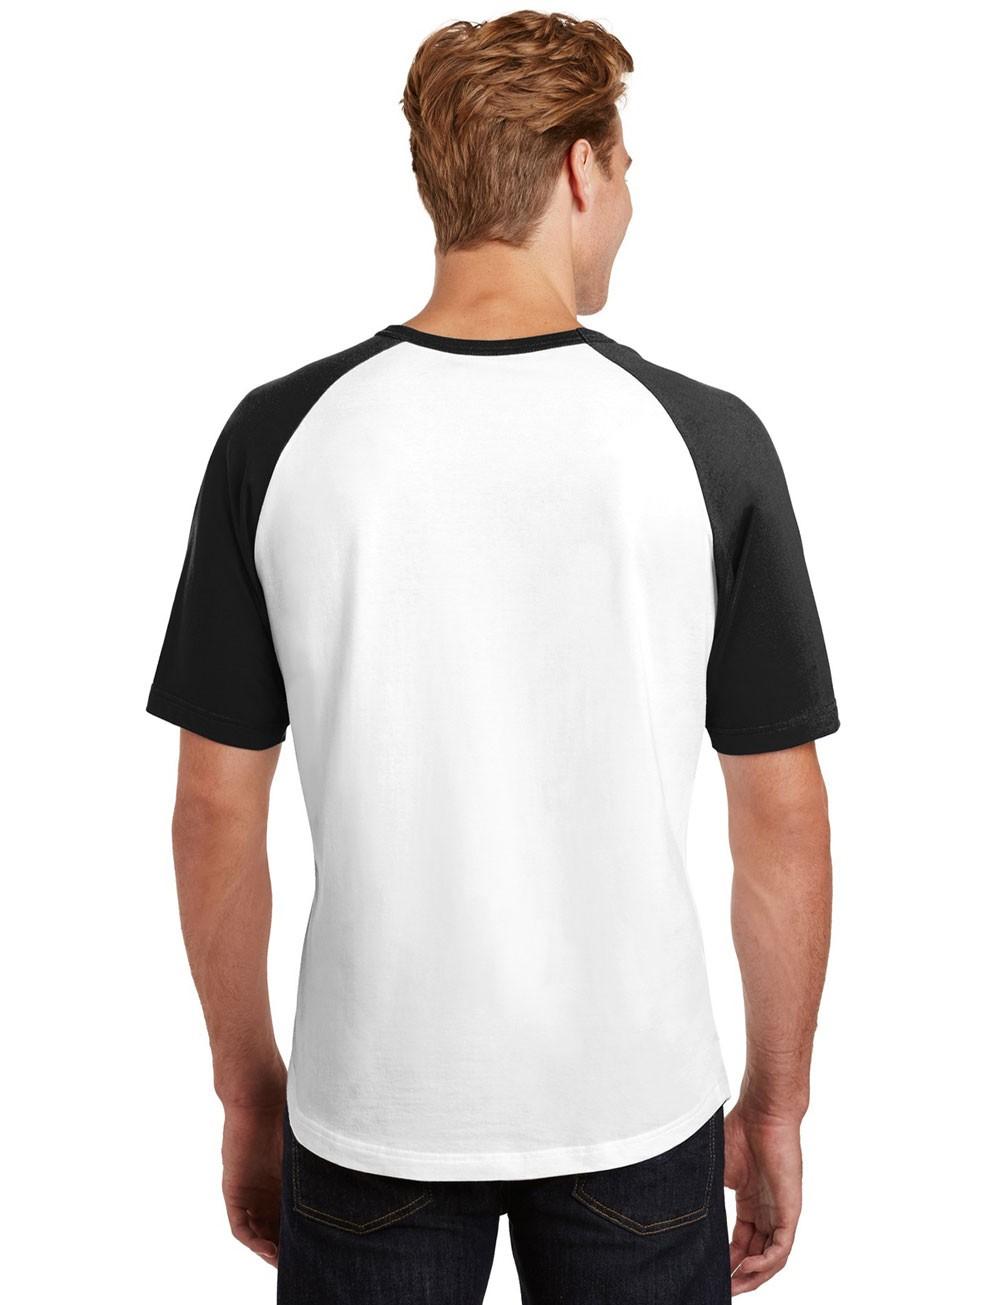 Camiseta Raglan Masculina Religiosa Cristã Fé ES_171